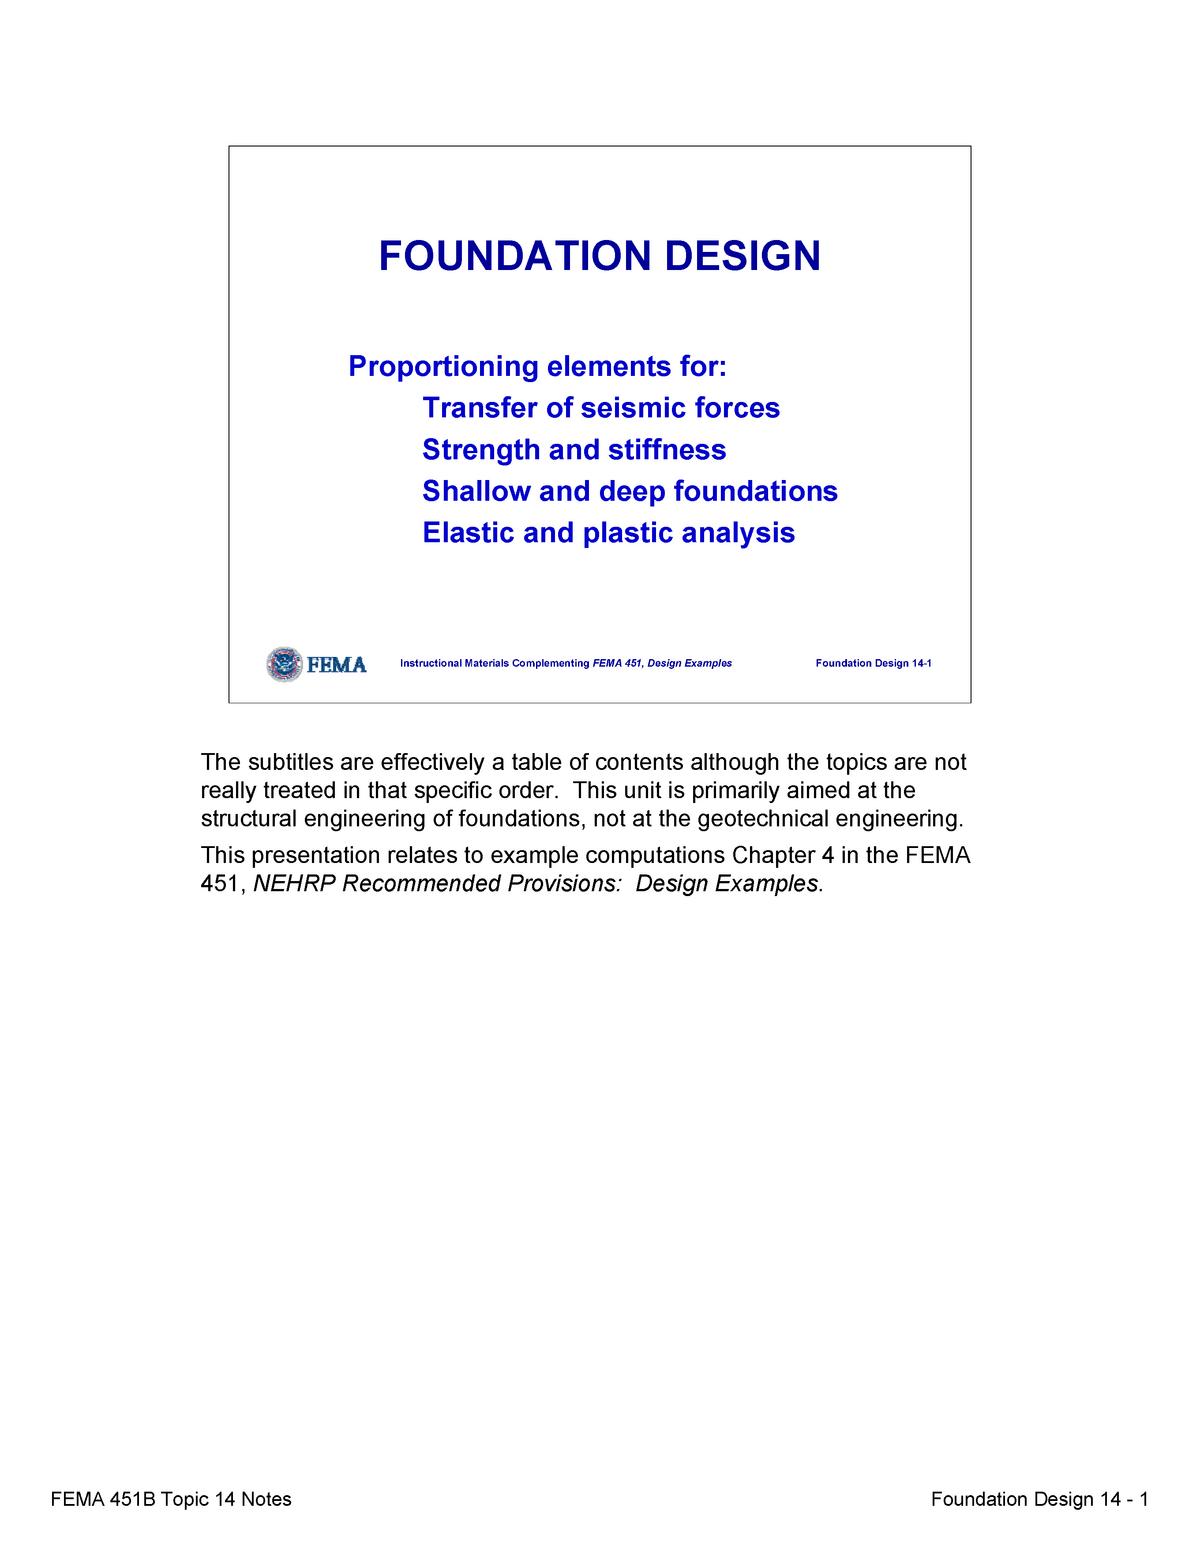 Topic 14 Foundation Design Notes Civl 8119 Uofm Studocu